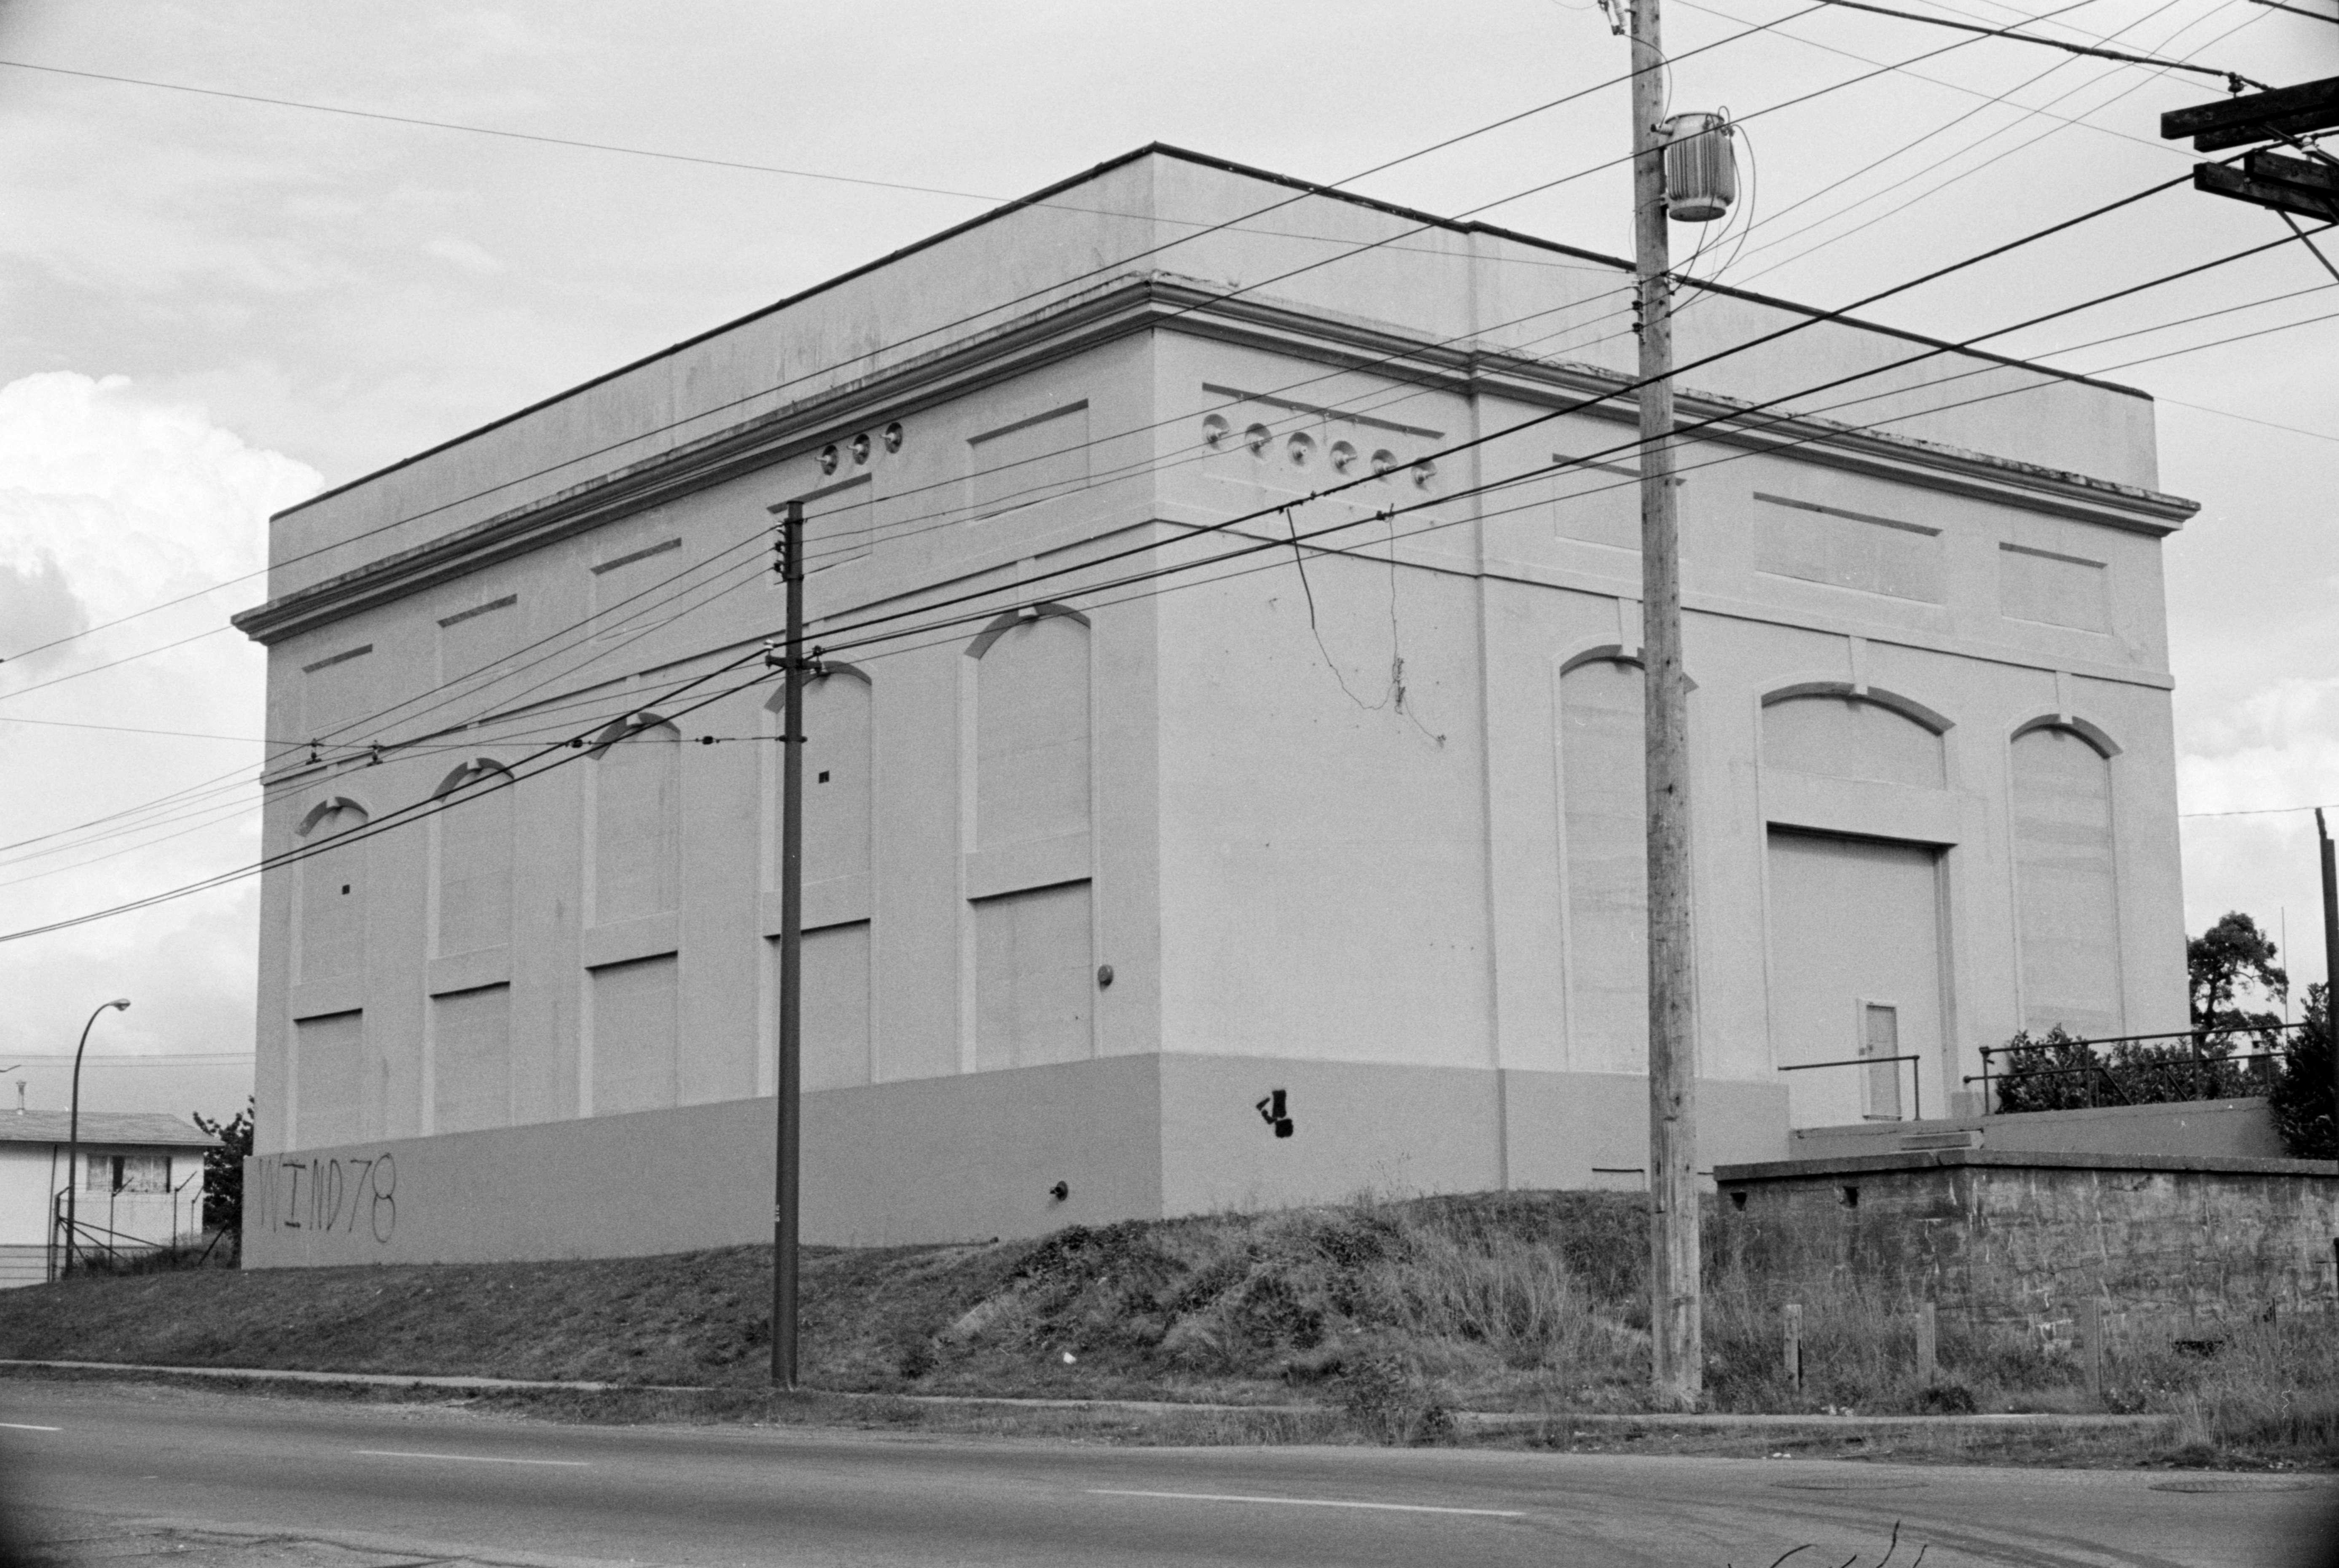 B C  Hydro Substation, Earles and Van Ness [4590 Earles